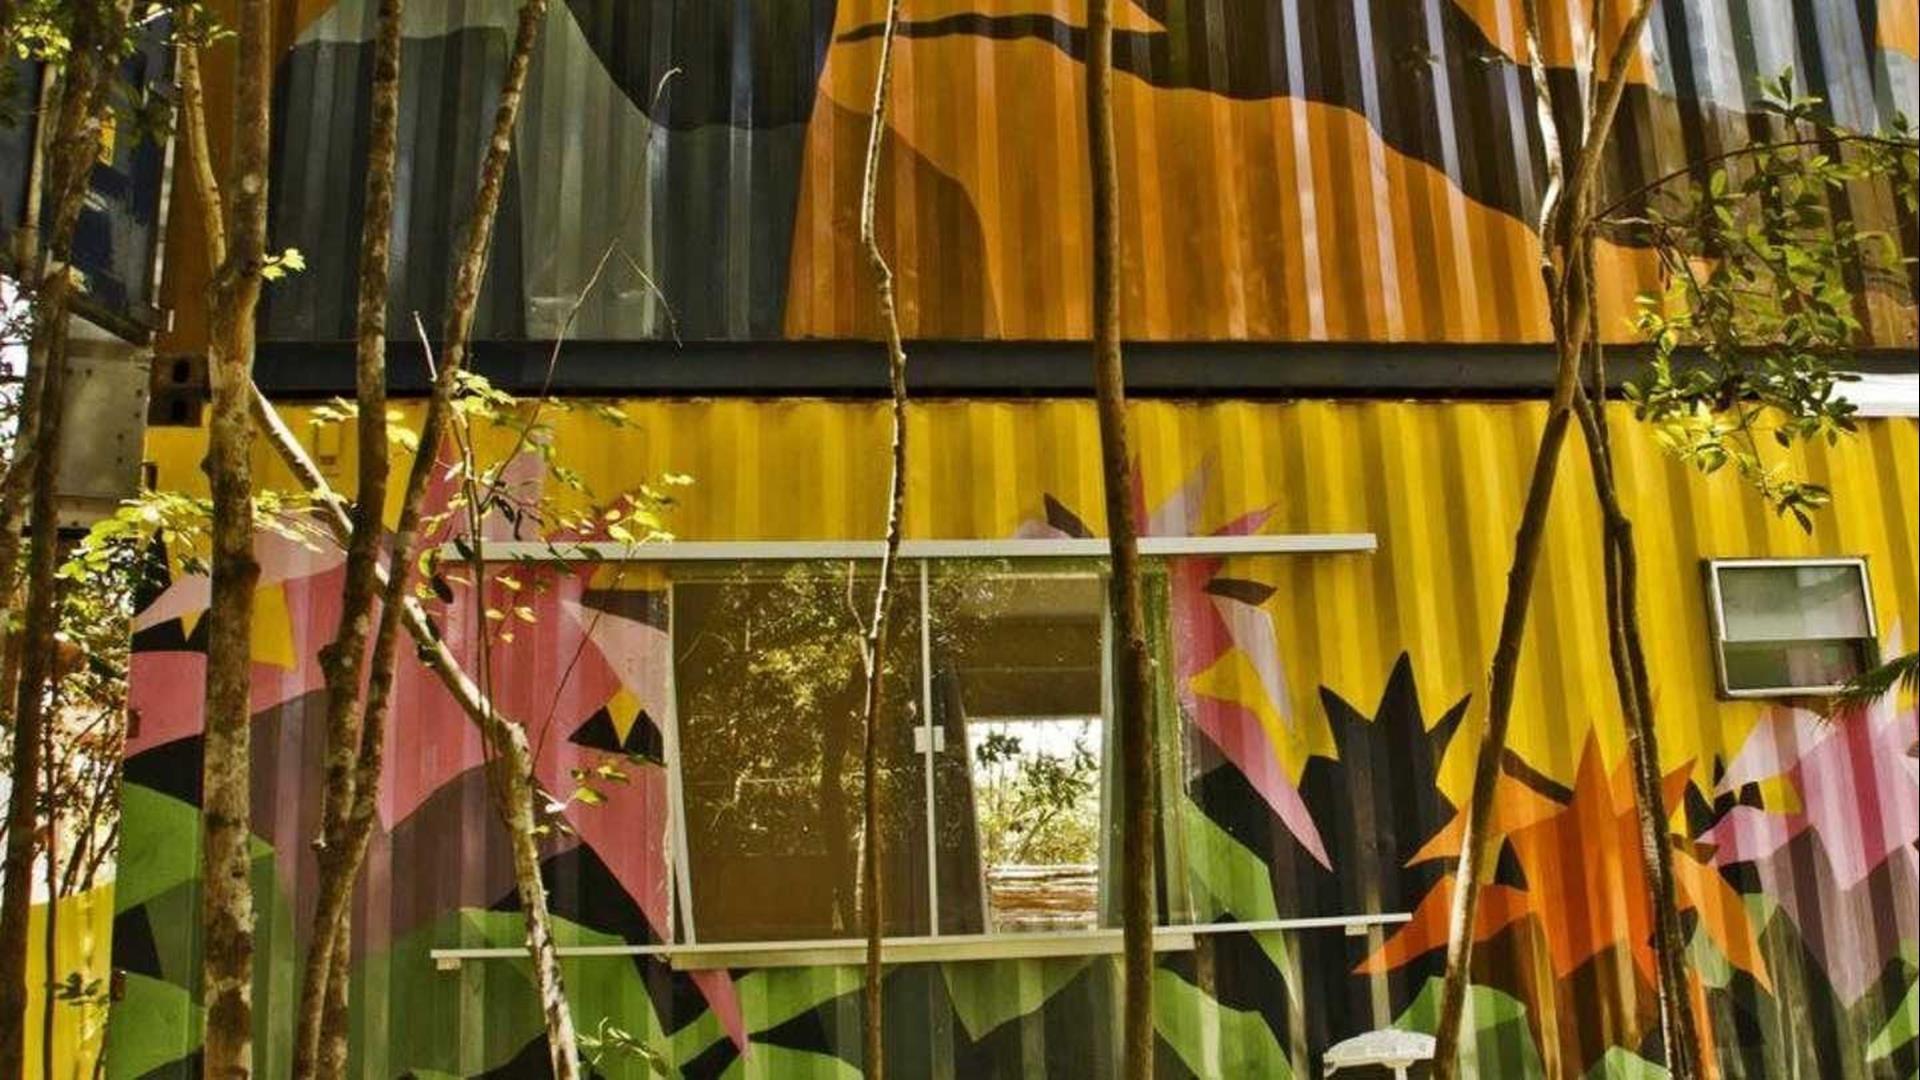 Brasilien Pipa: Landestypische Unterkunft - Bakano Eco Pousada